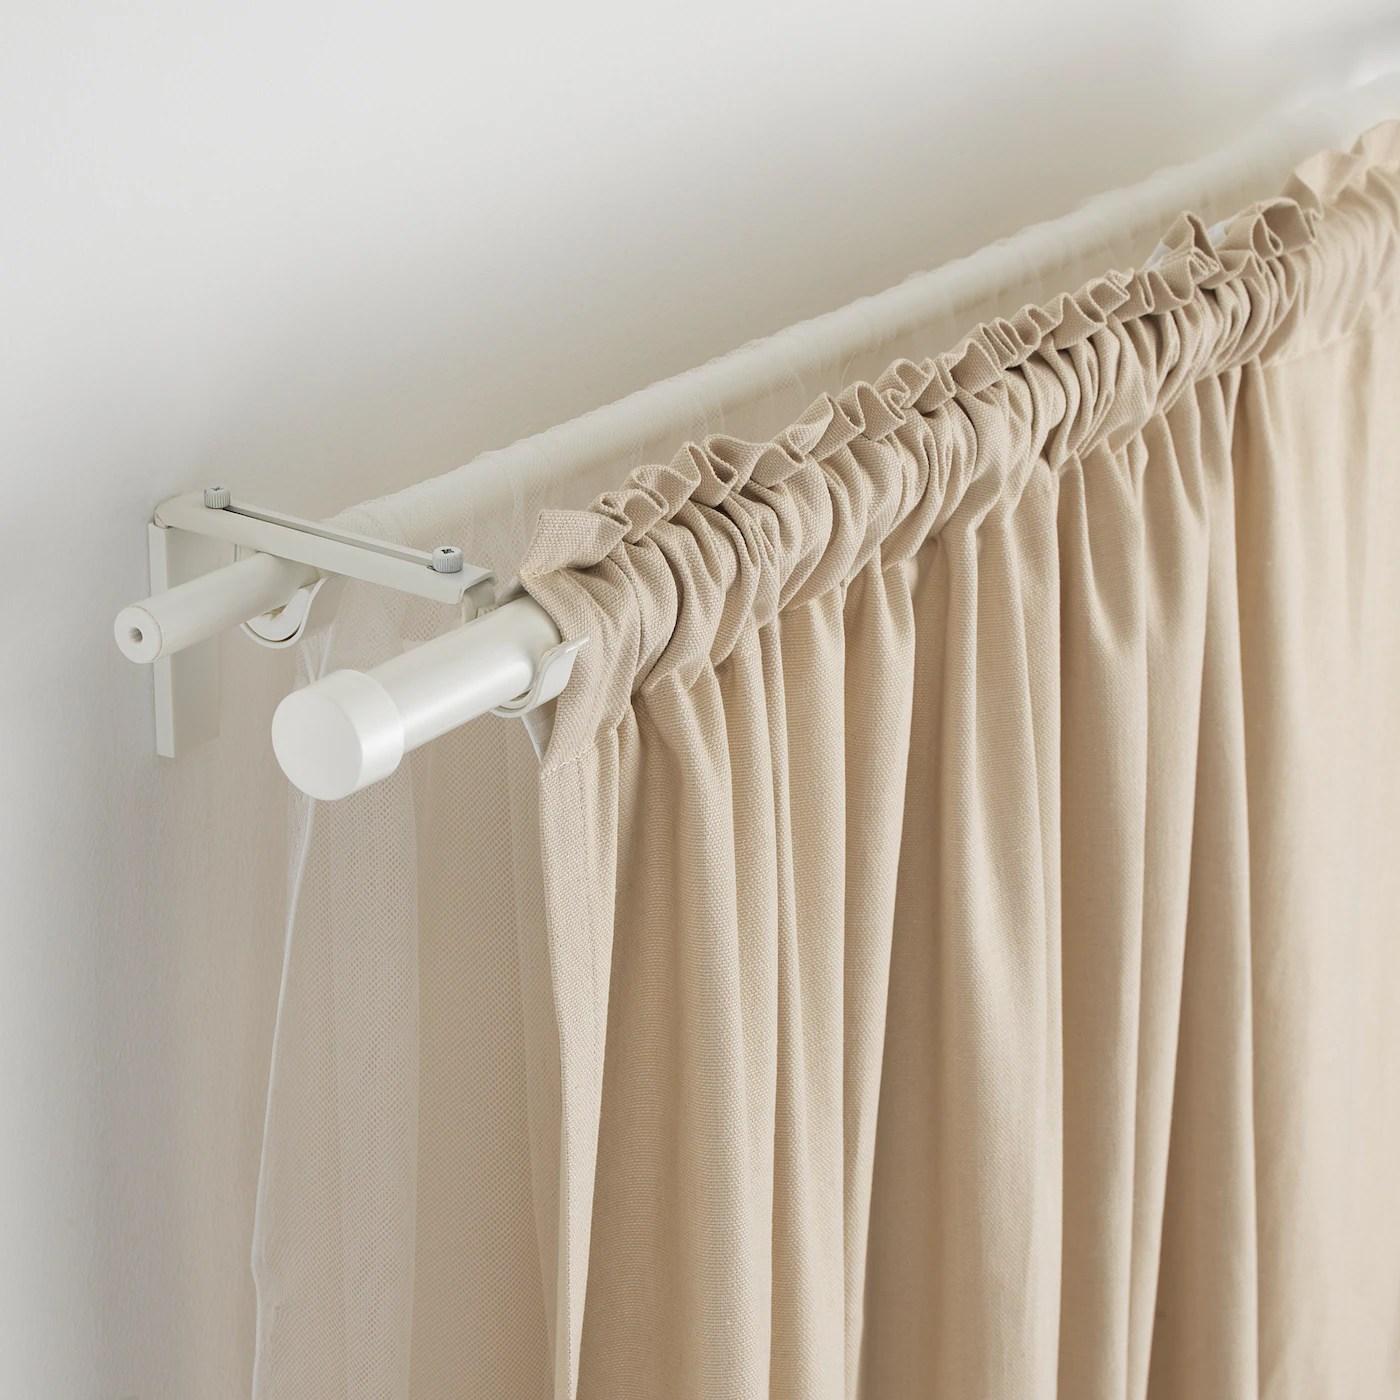 racka hugad double curtain rod combination white 82 5 8 151 5 8 210 385 cm